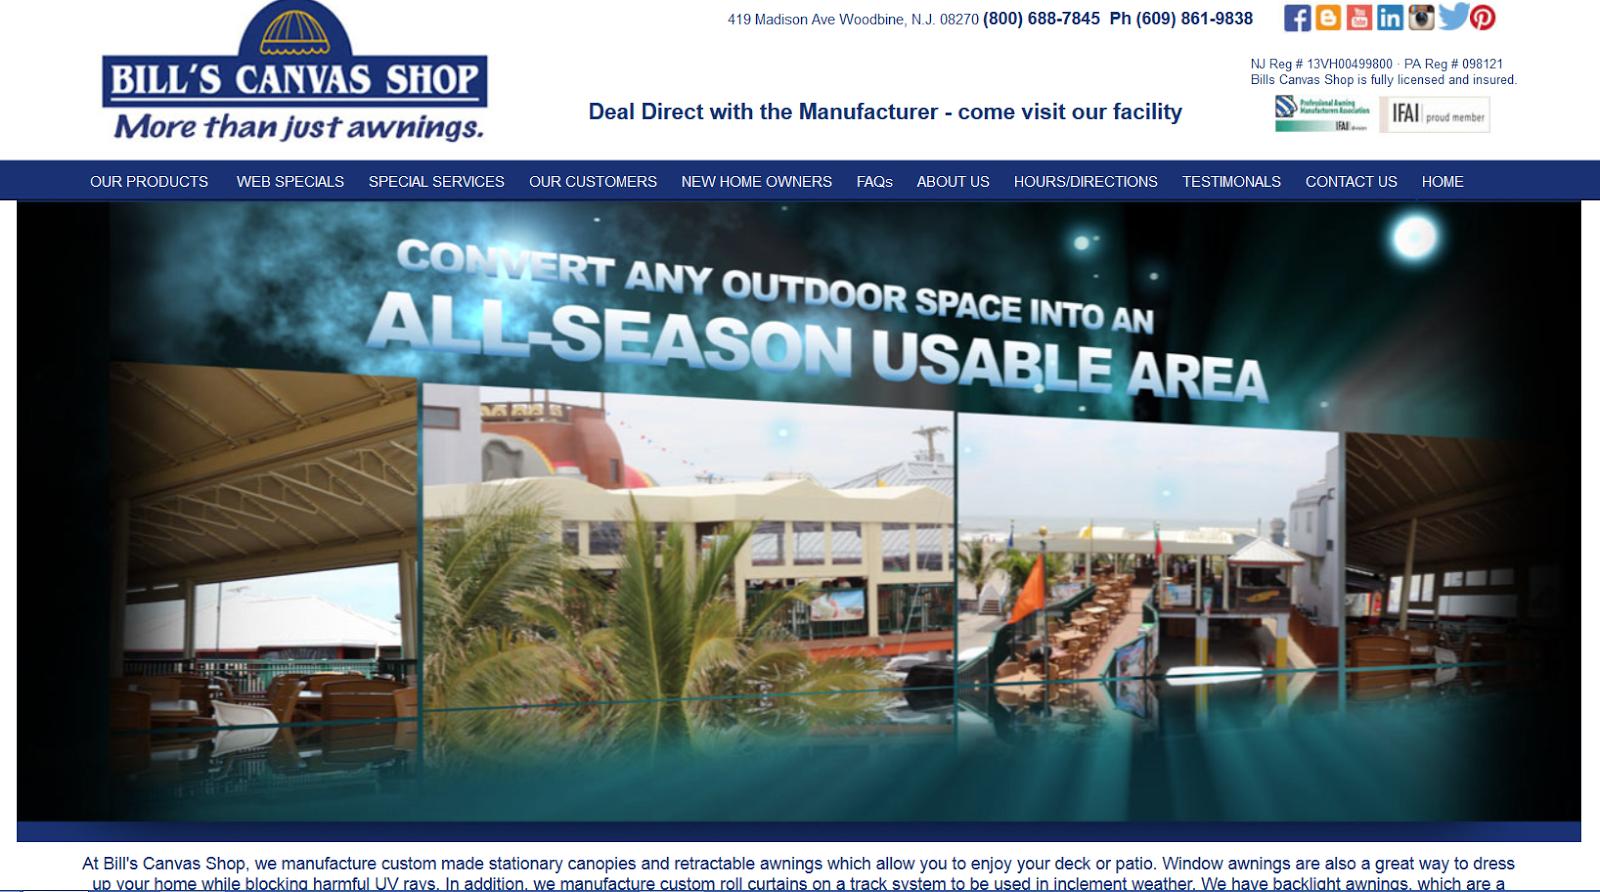 billscanvasshop.com